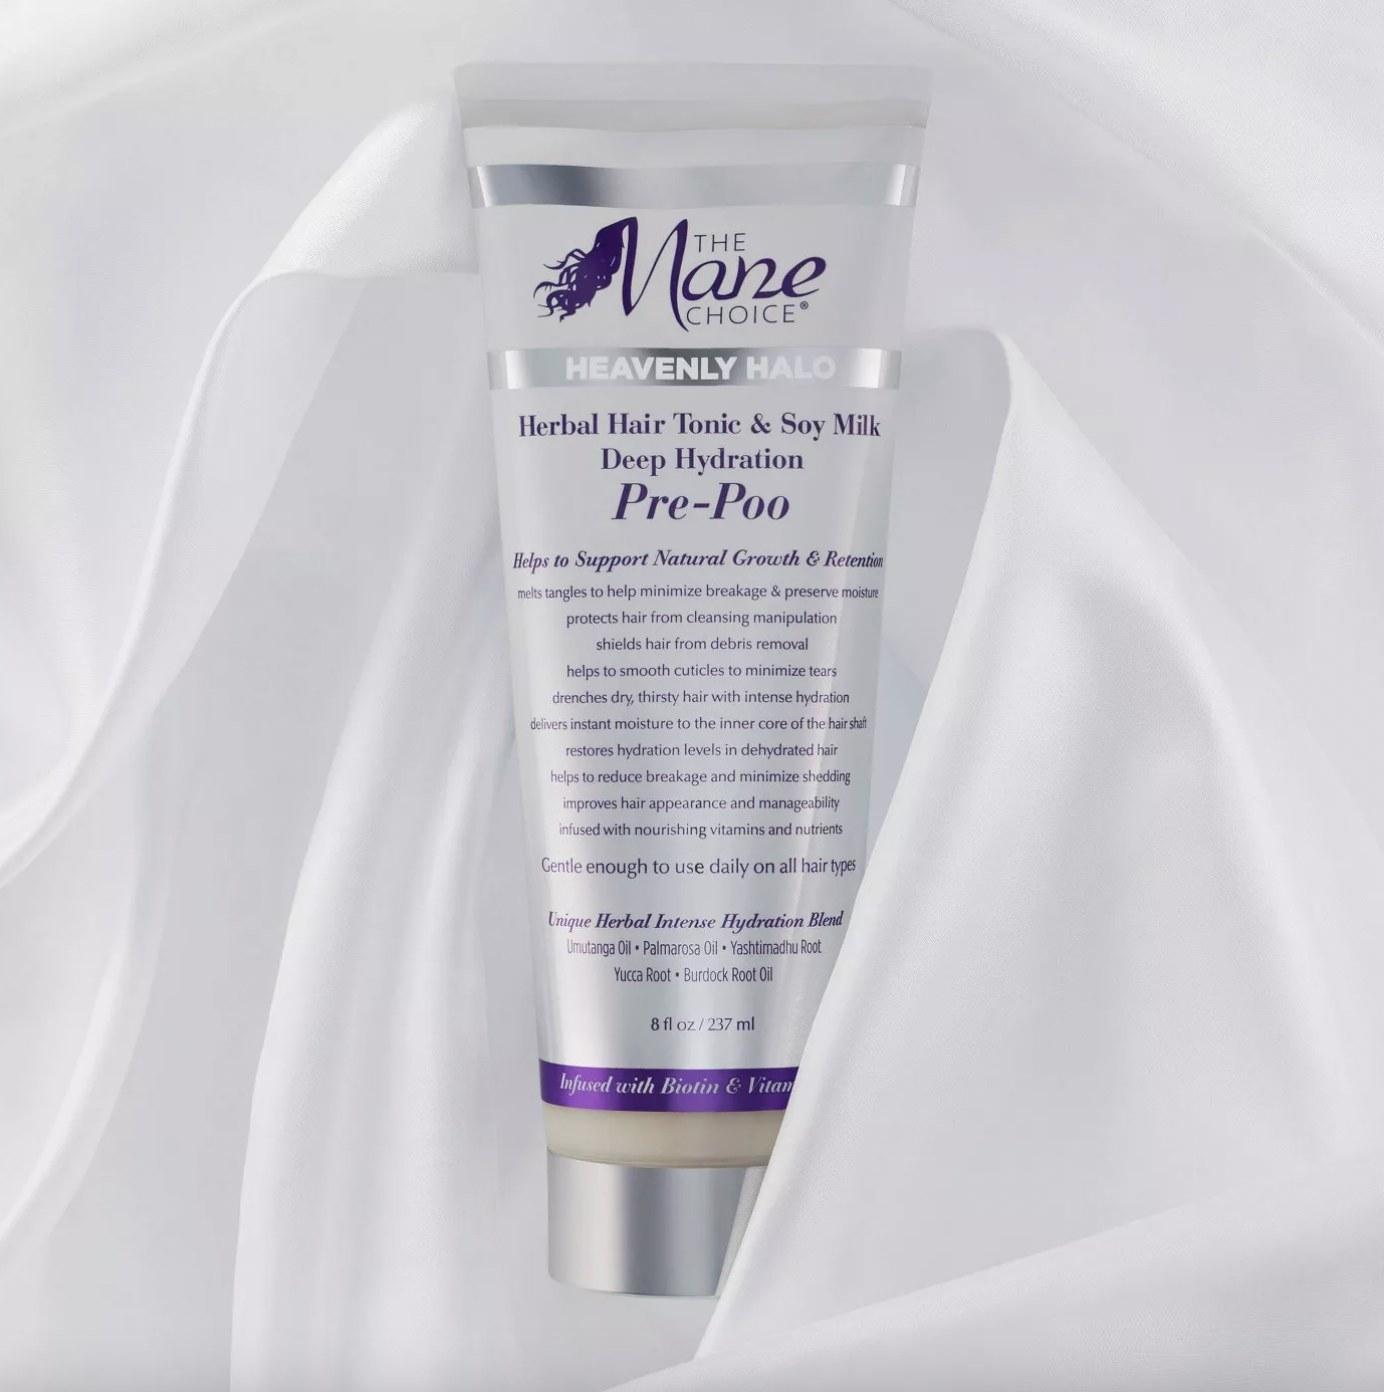 A tube of hair treatment